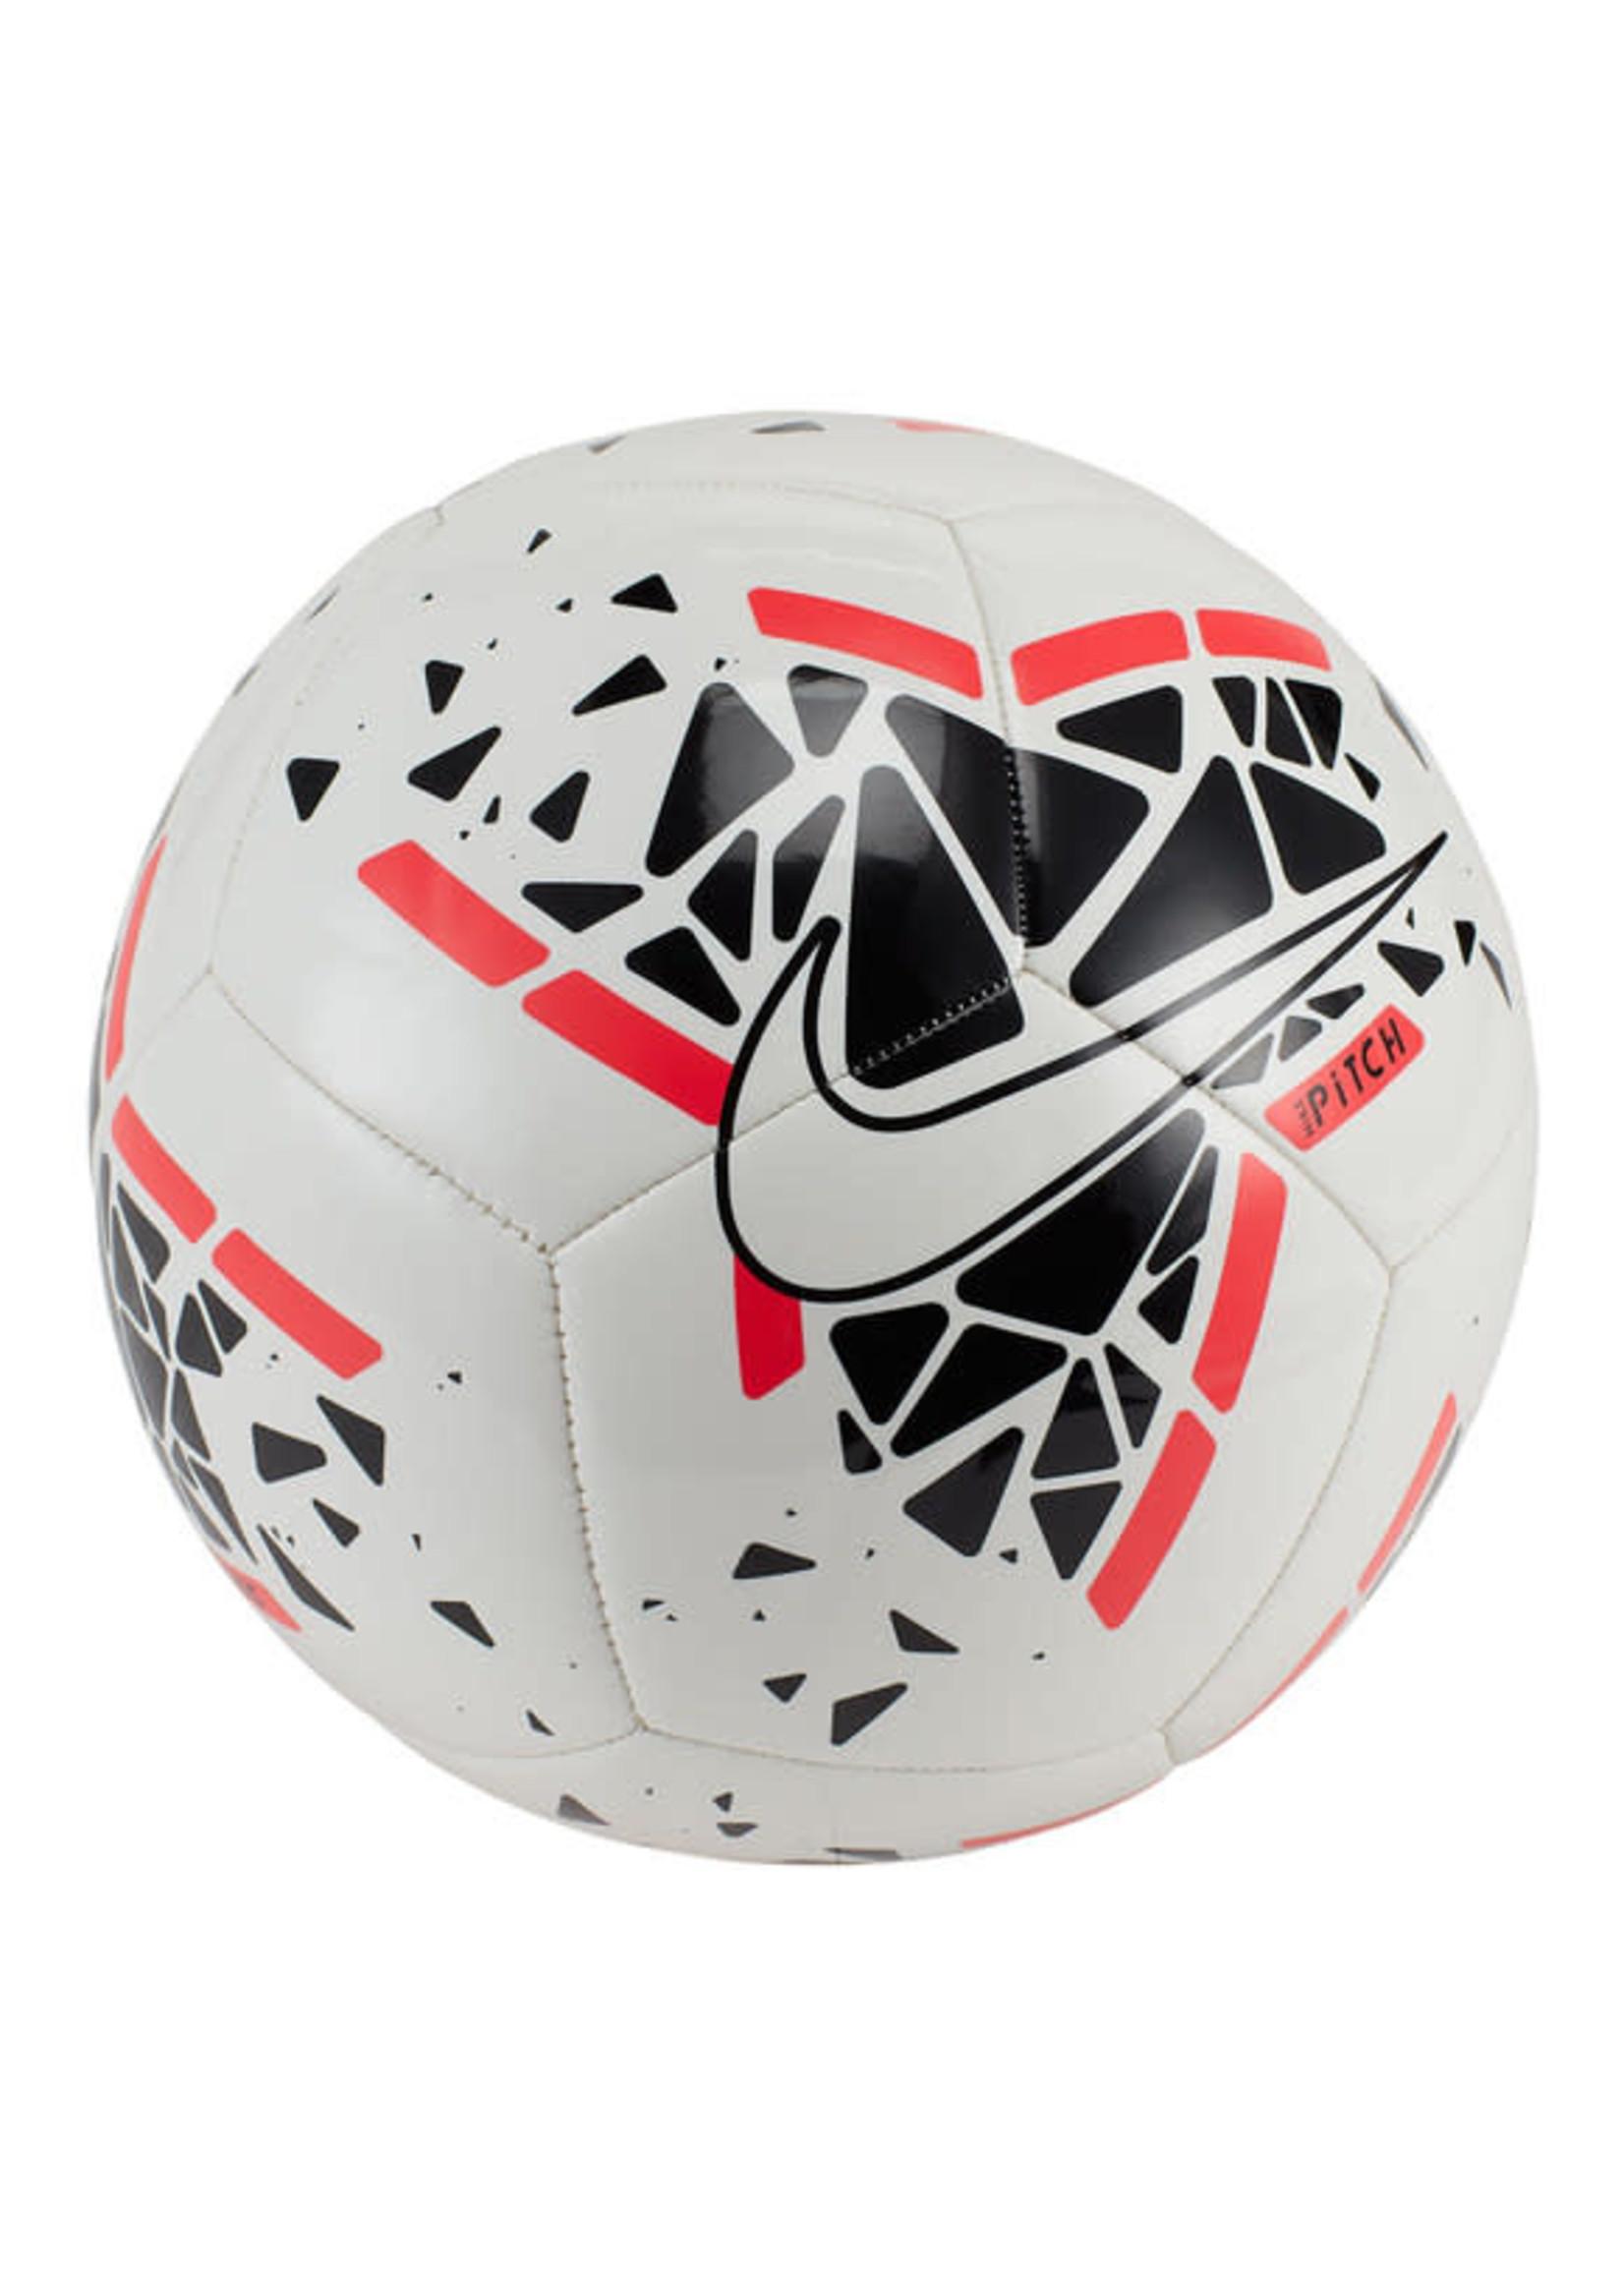 Nike Pitch Ball - White